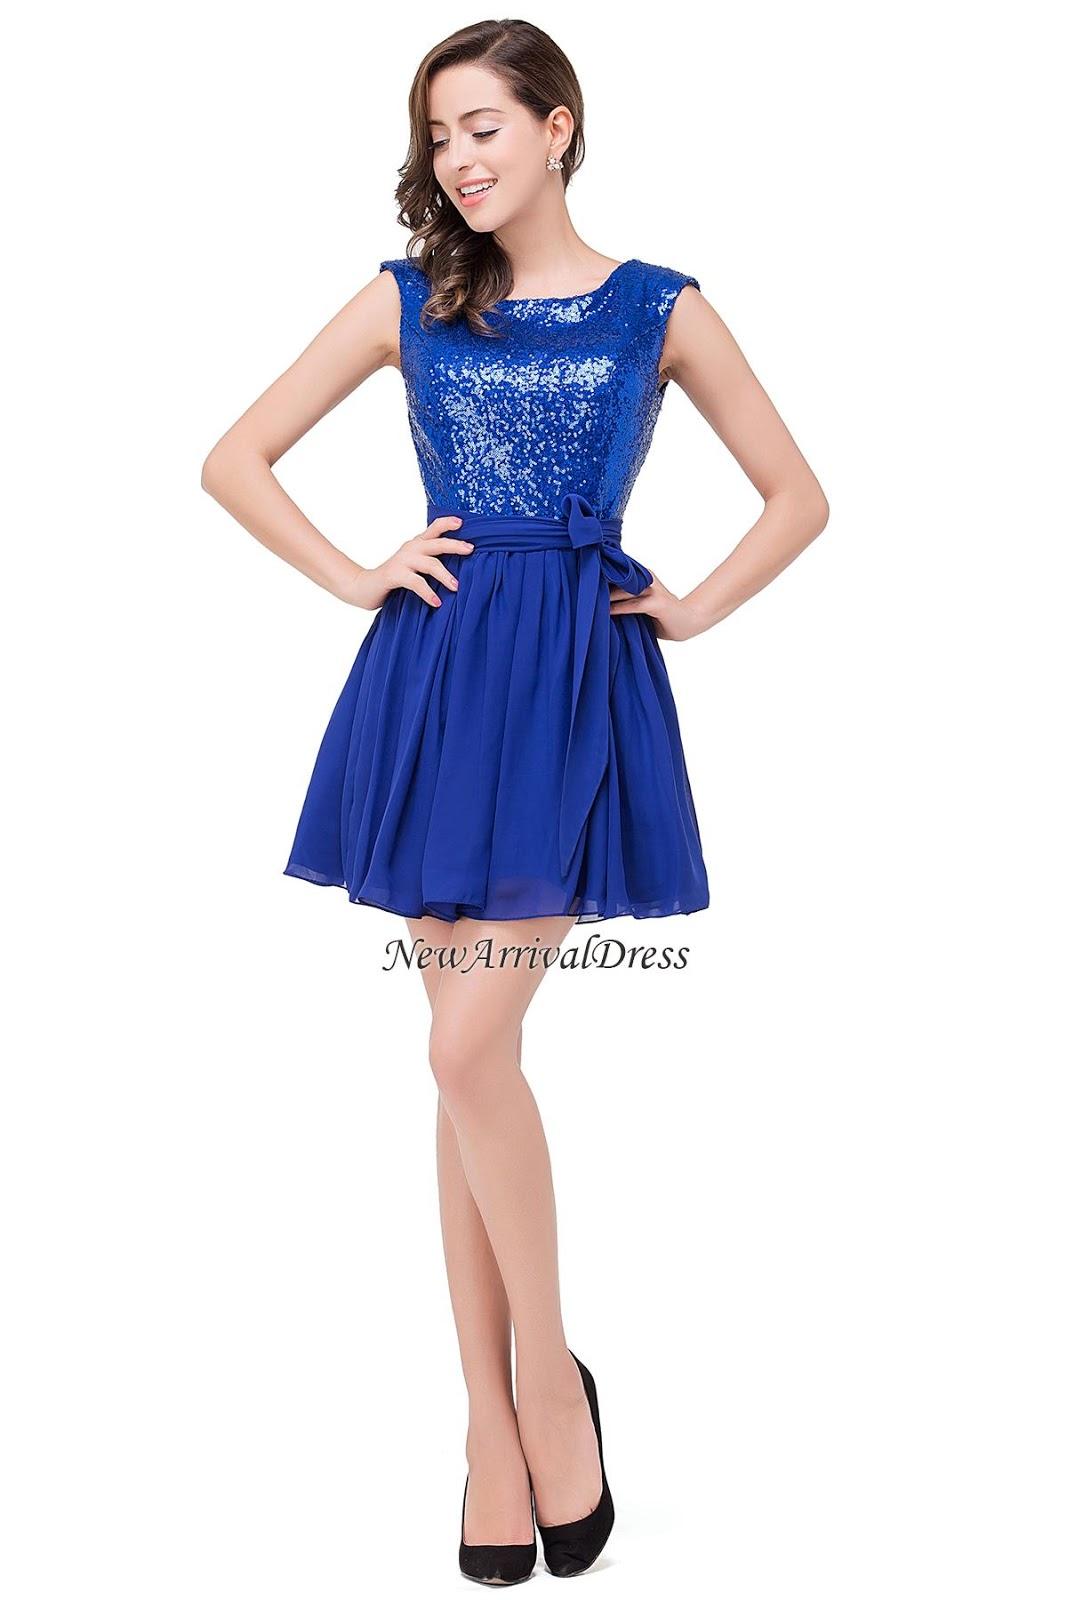 Chiffon Sequins Sleeveless Short Elegant Homecoming Dress